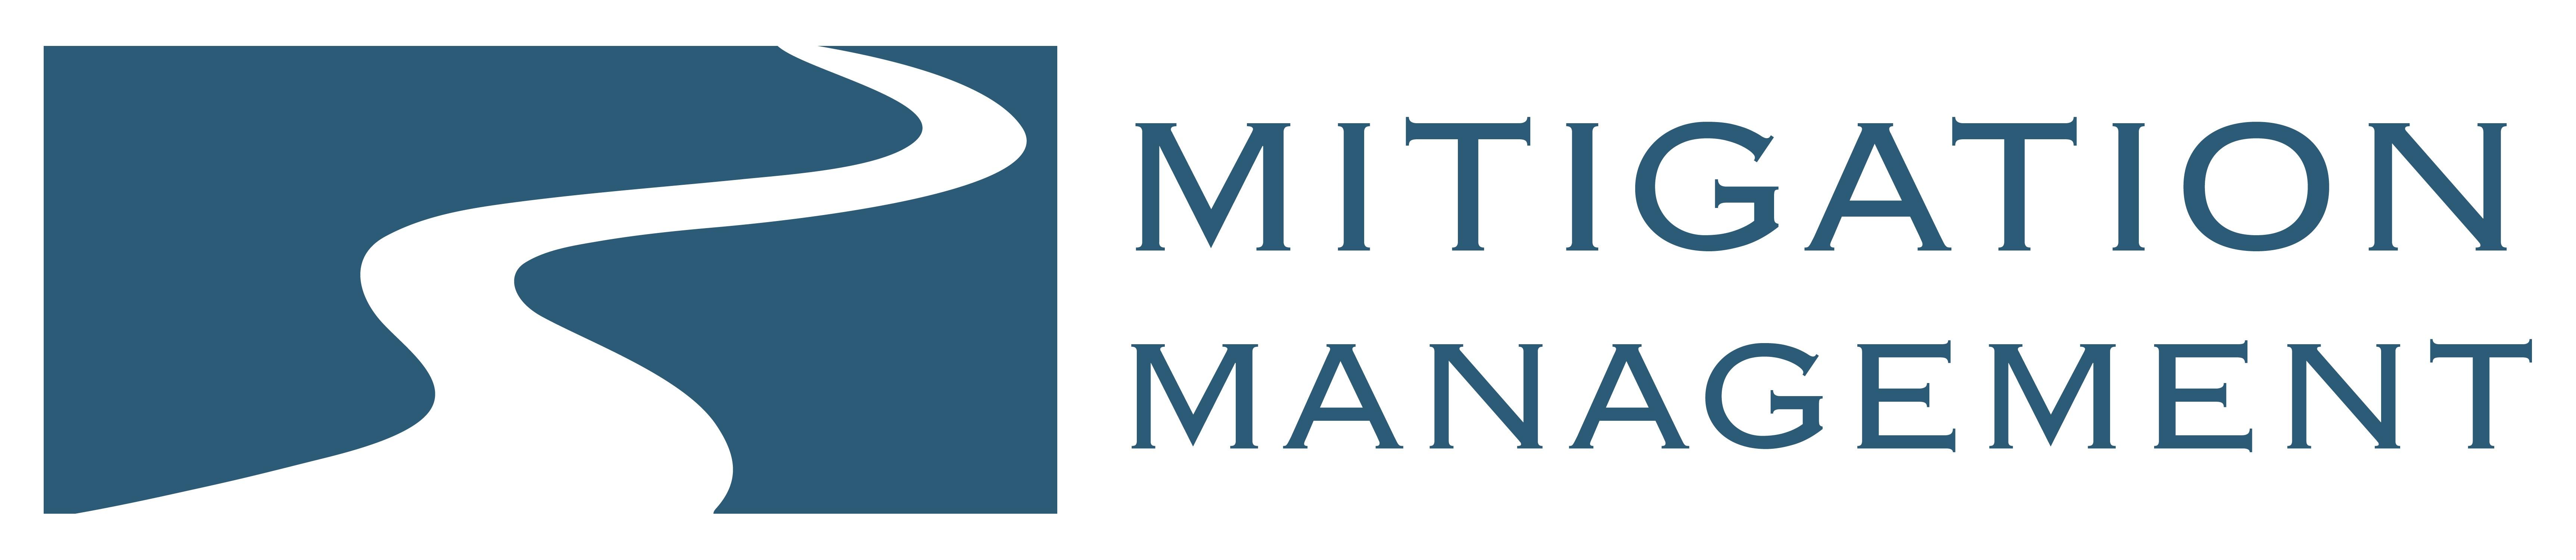 Mitigation Management